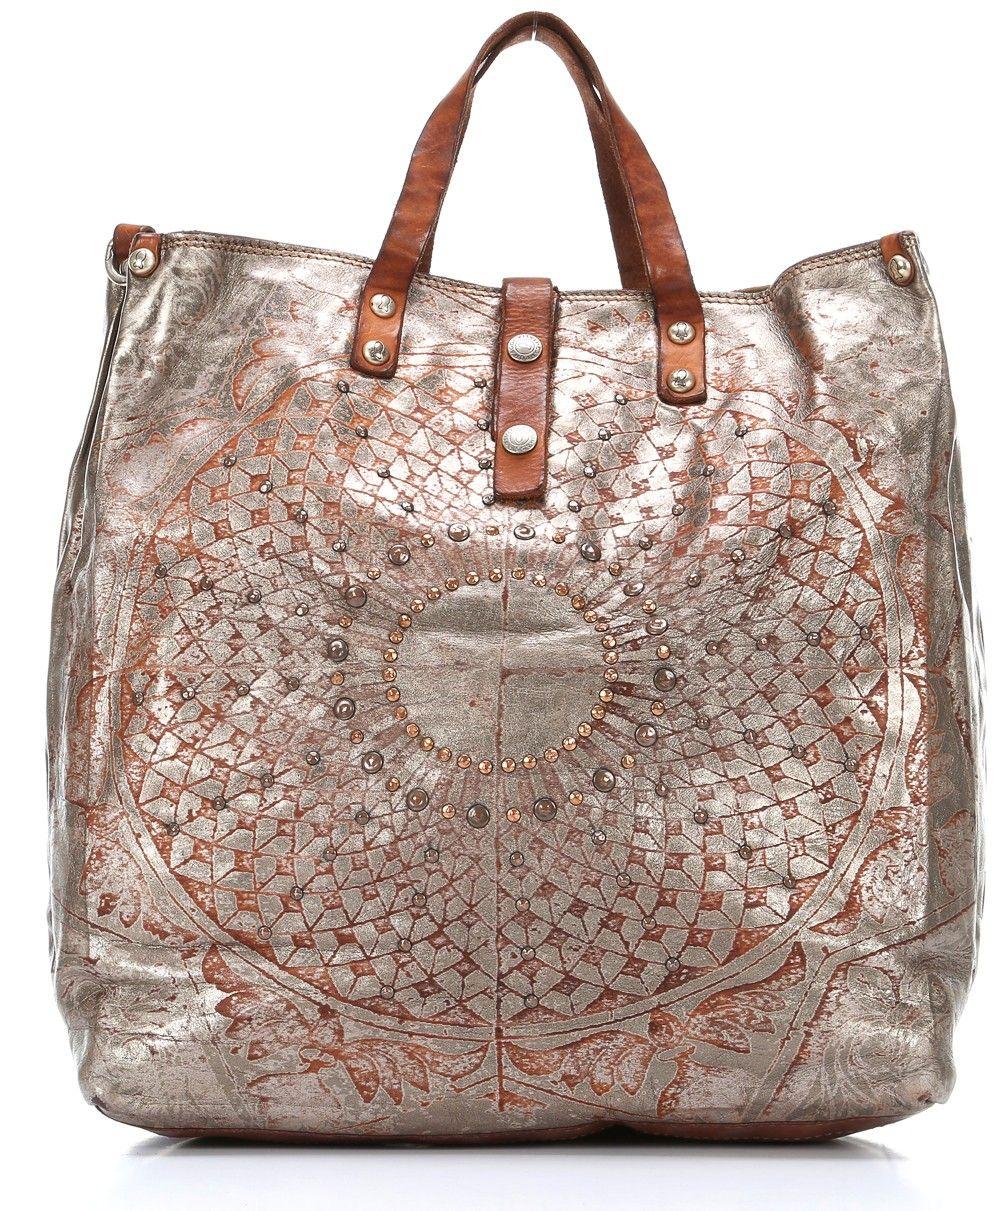 Silver leather tote bag uk - Tote Bag